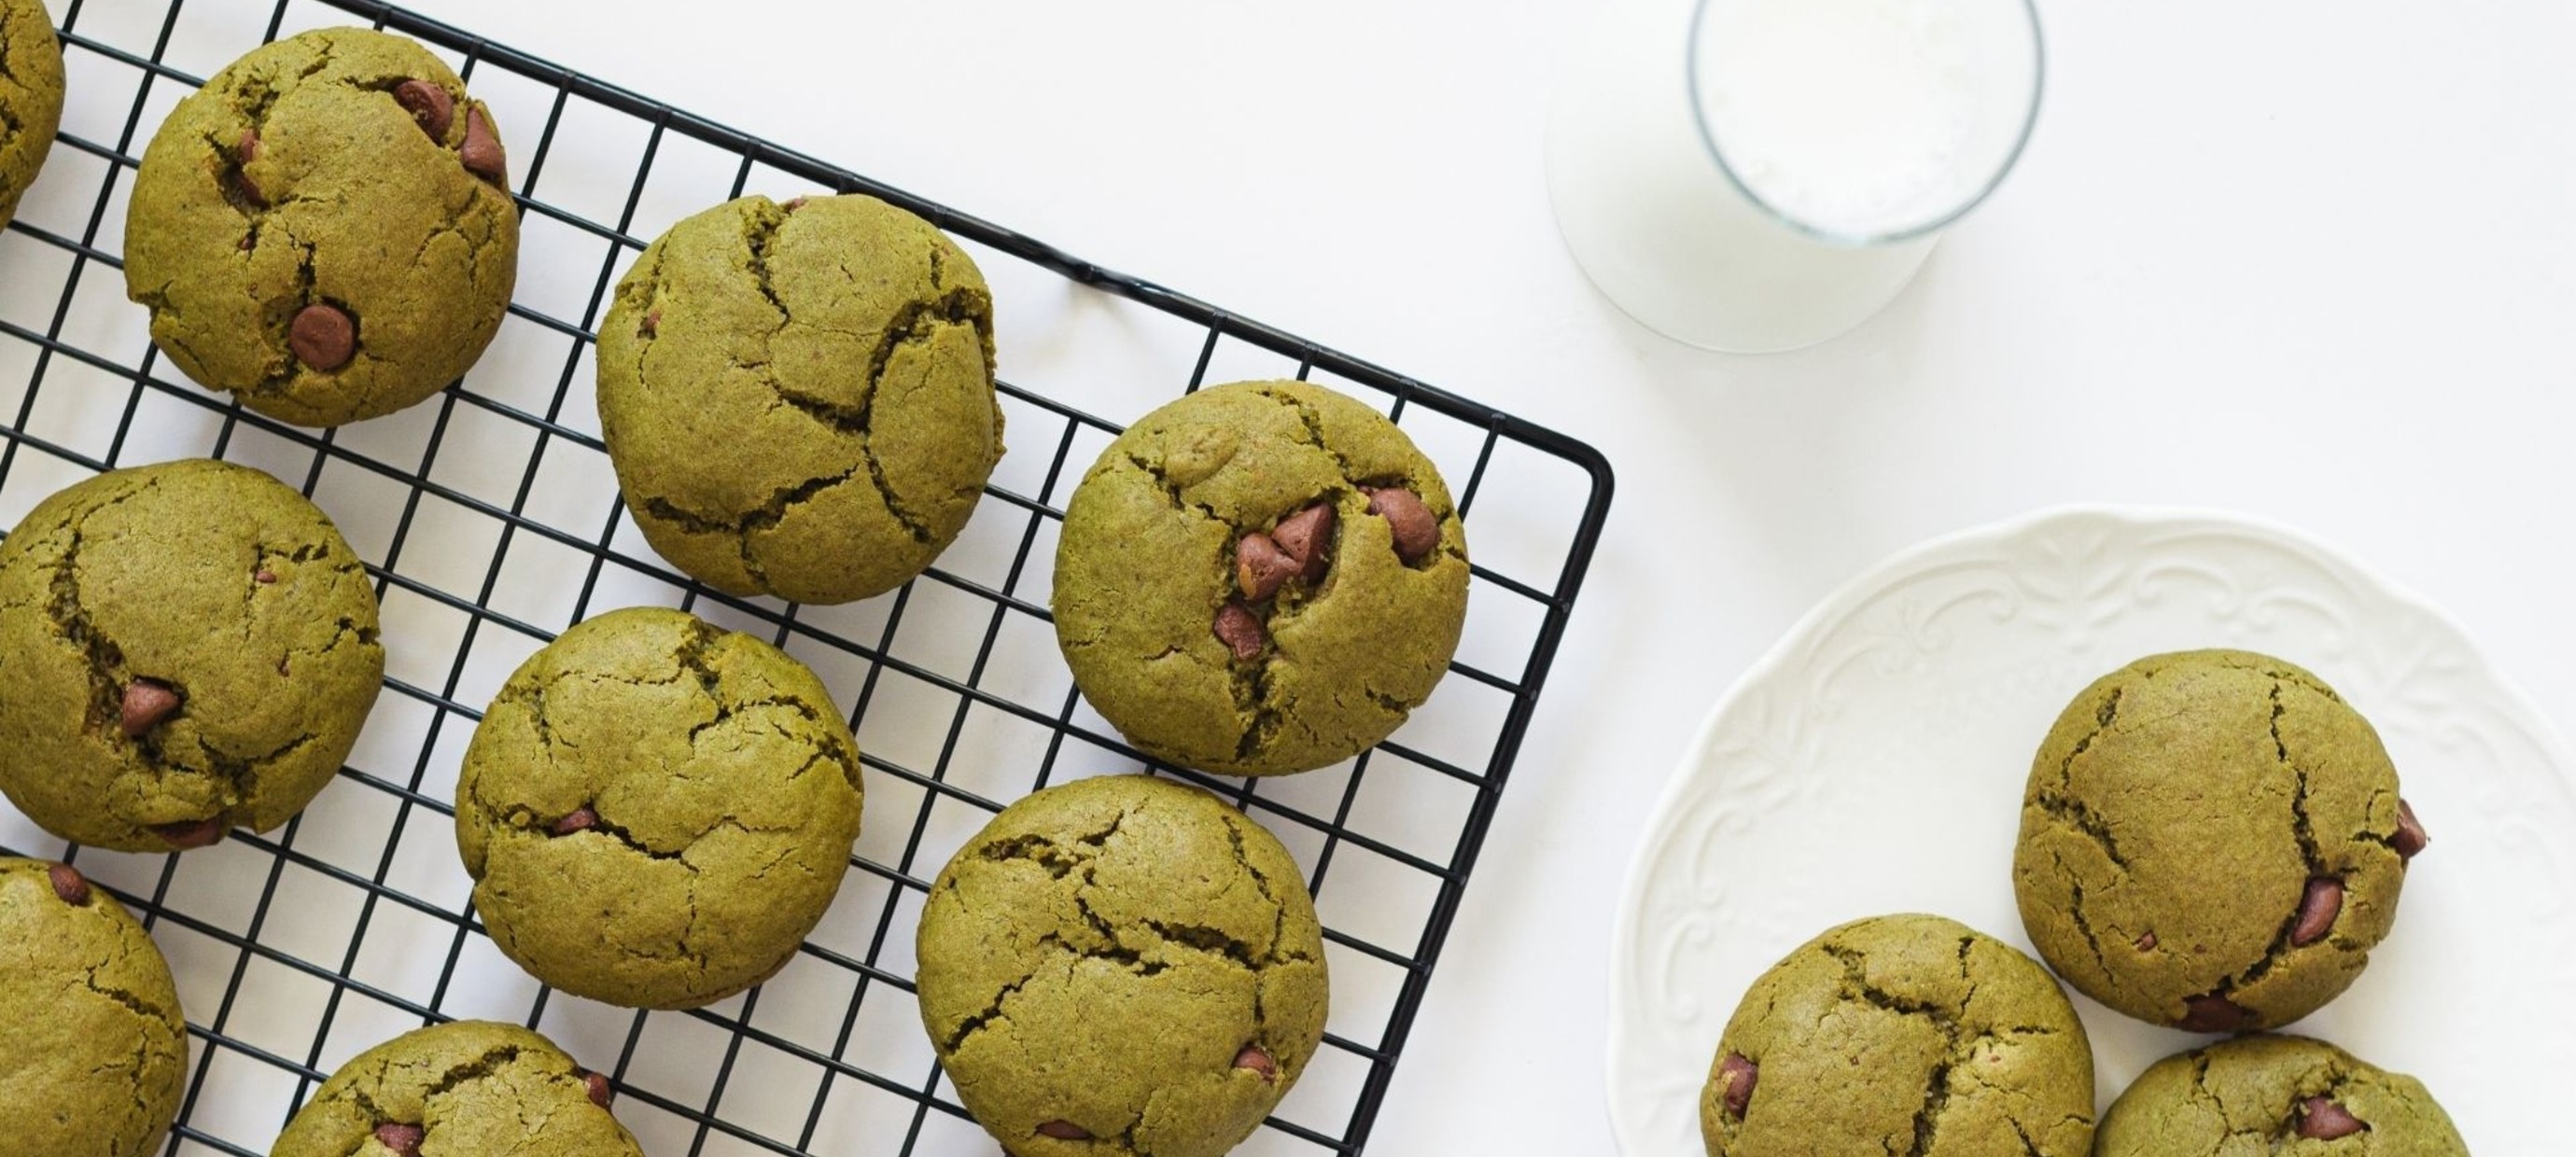 Recept: matcha chocoladekoekjes